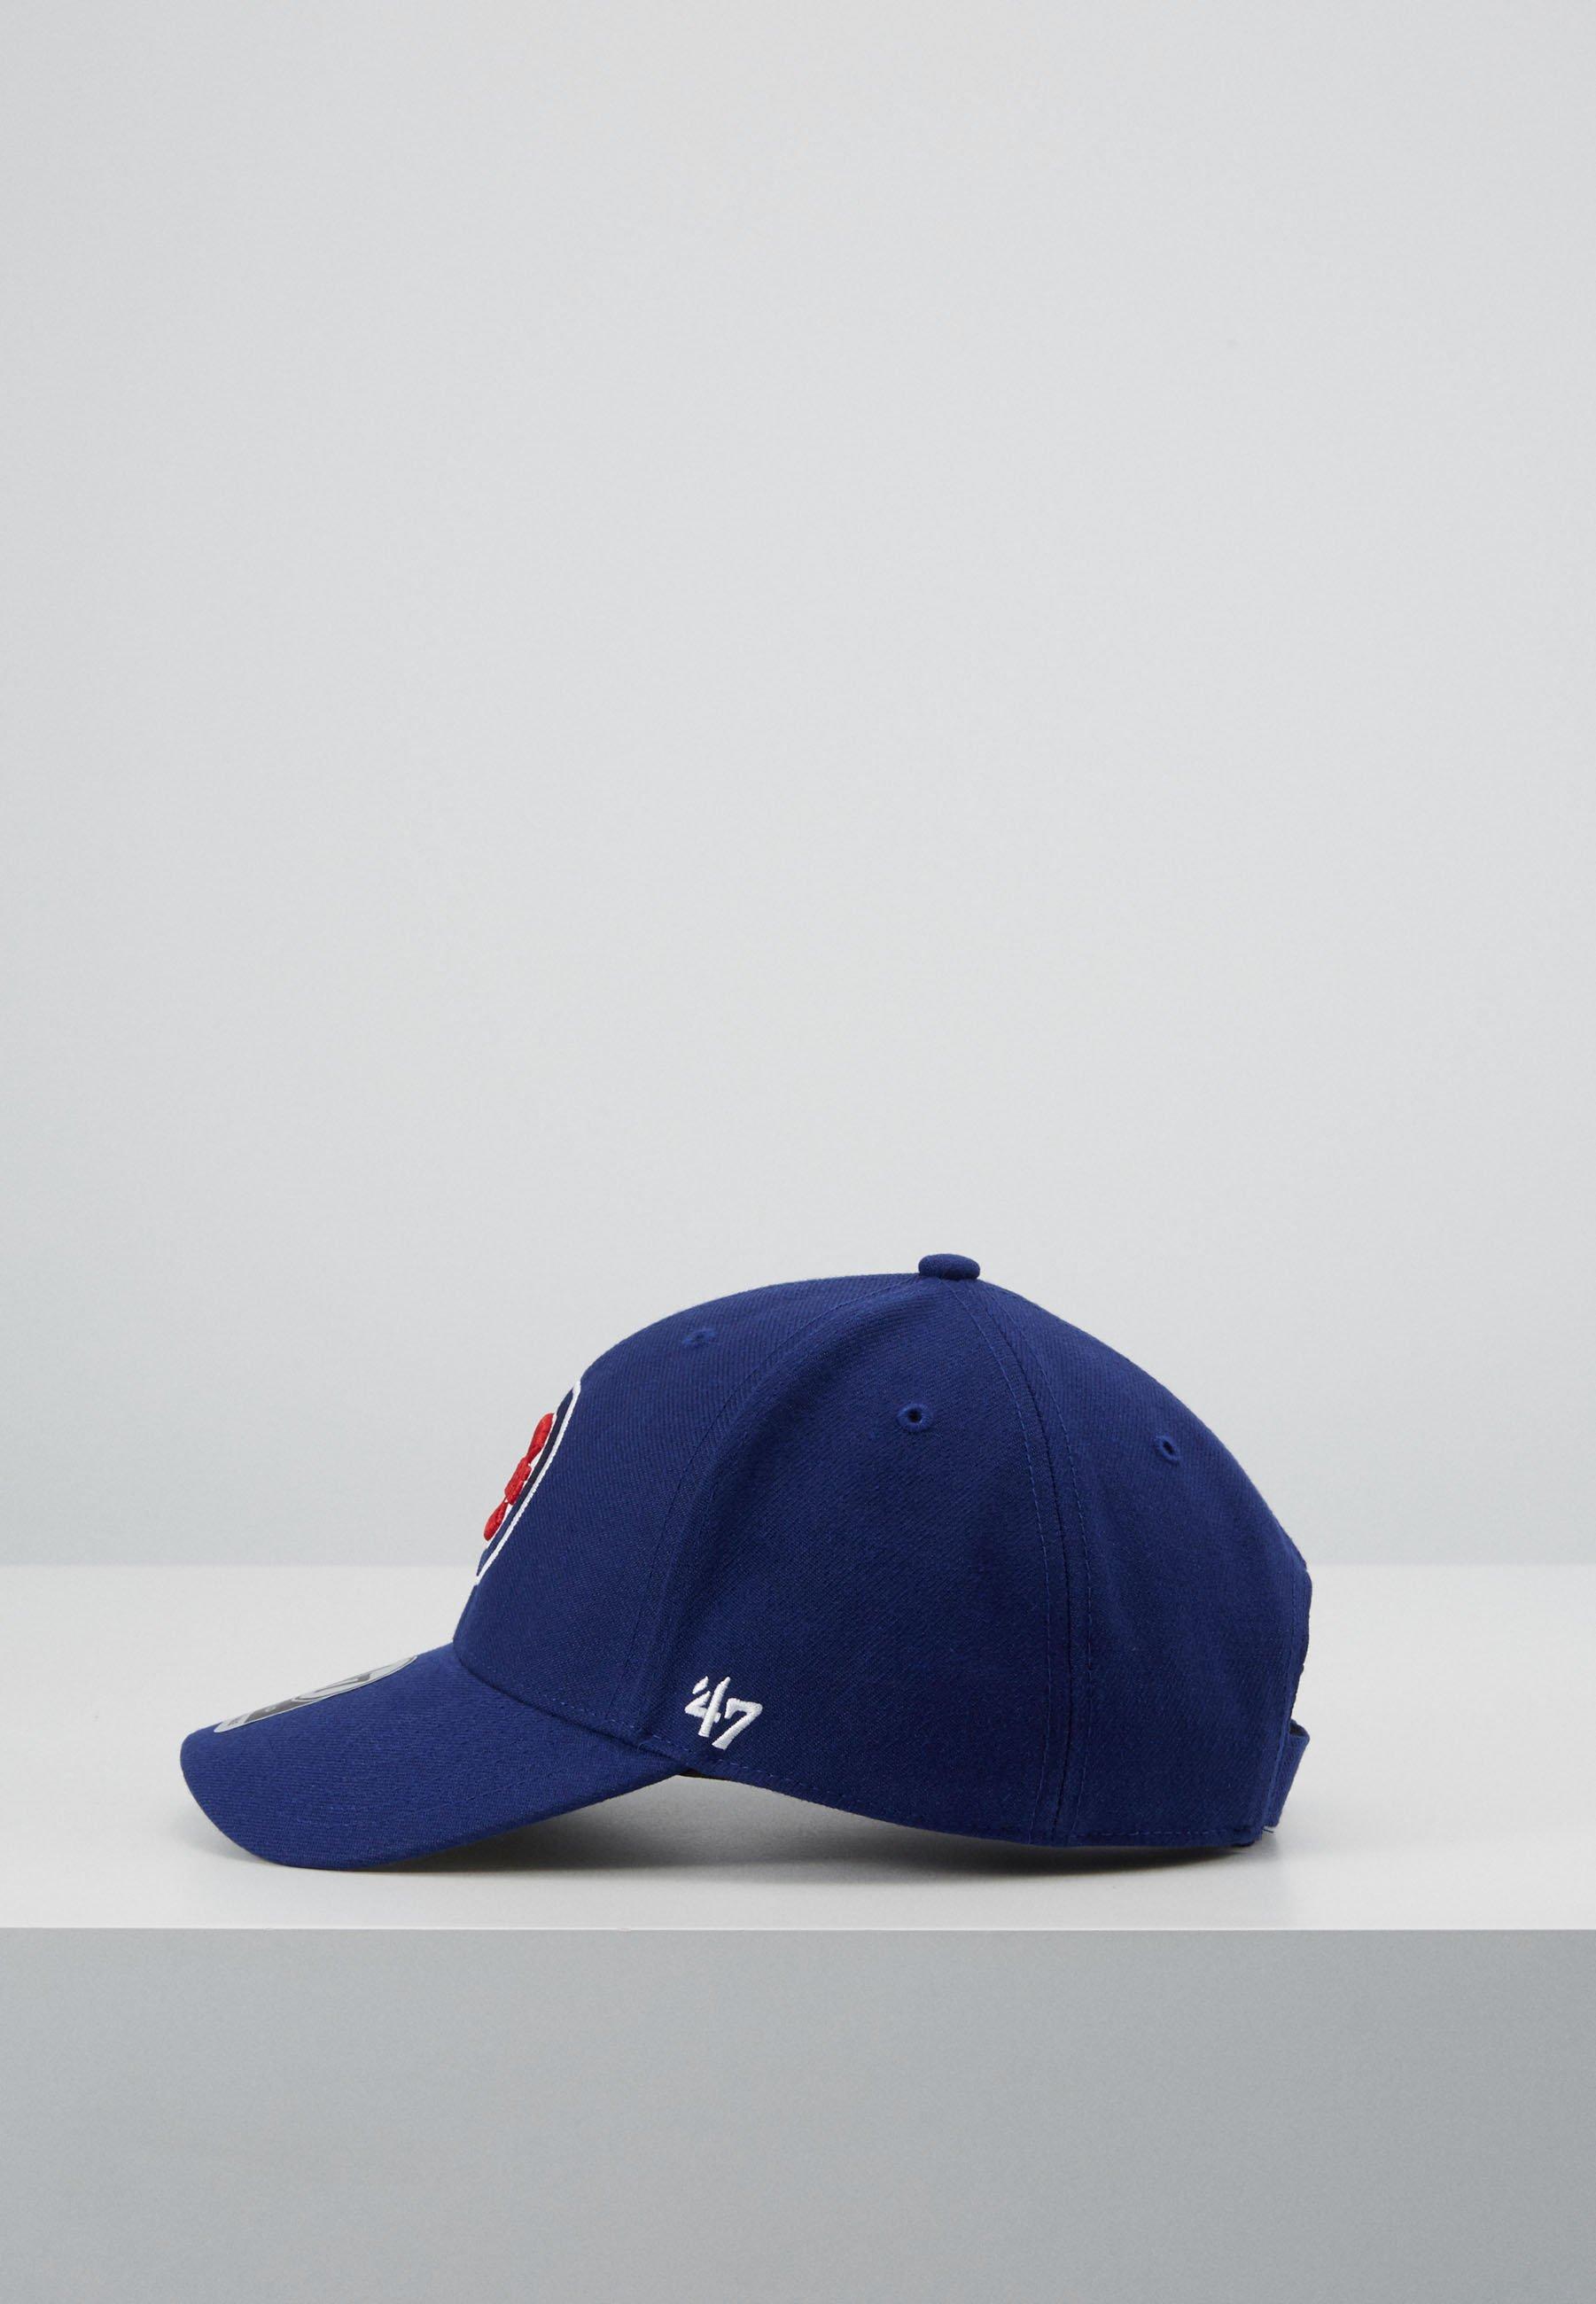 '47 CHICAGO CUBS 47 MVP - Cap - dark royal/mørkeblå N0M5bIOU5aNMCfu